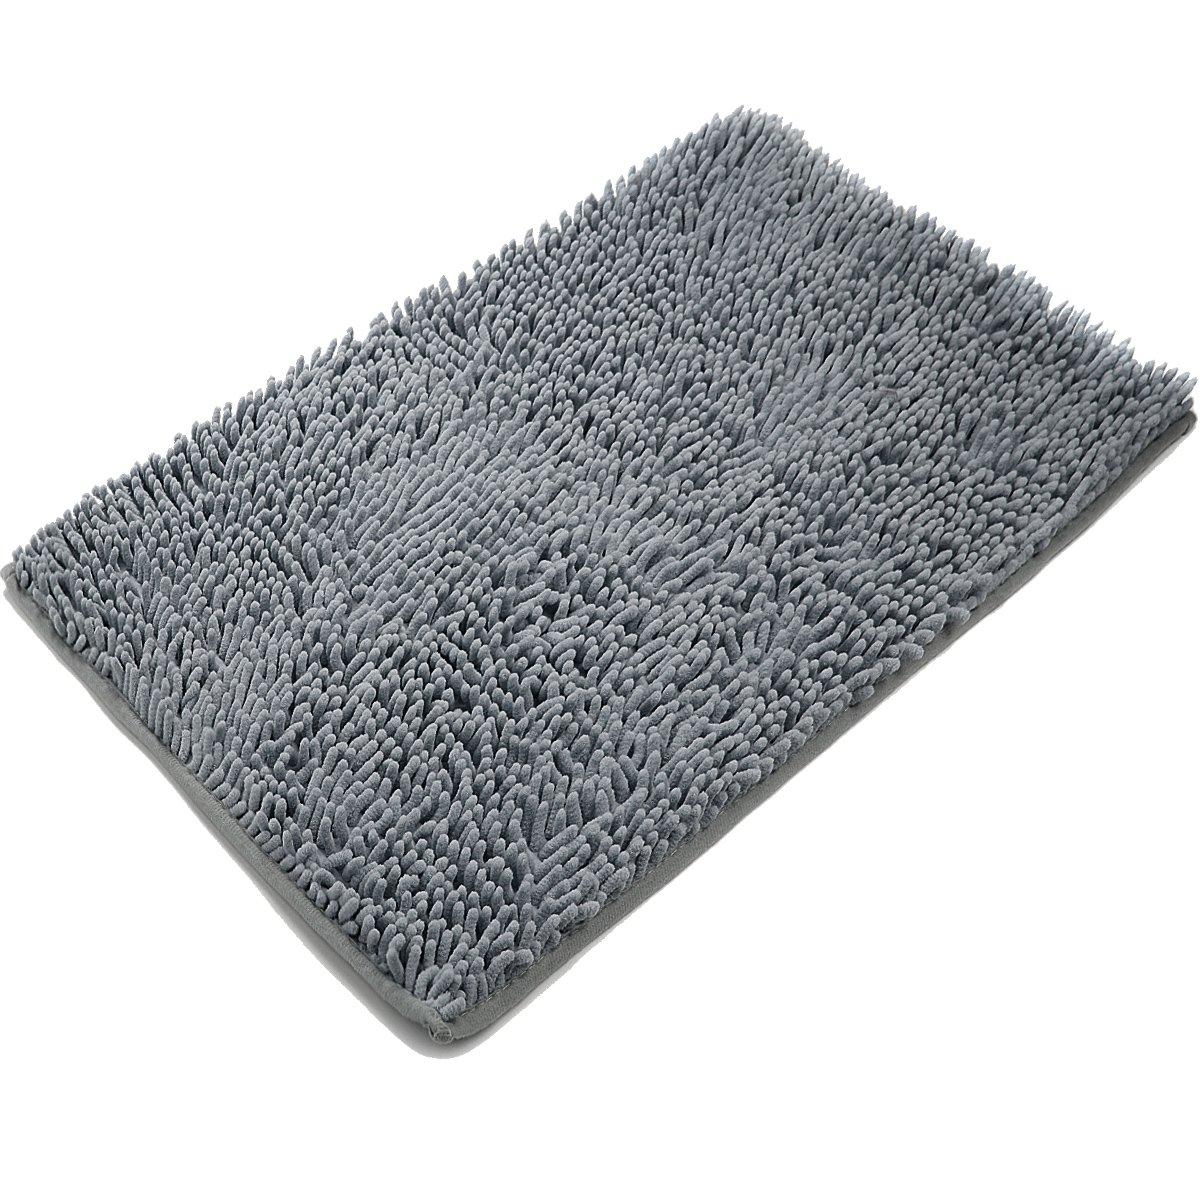 Delicieux Non Slip Microfiber Shag Bathroom Rug Dark Gray Bath Mats Shower VDOMUS